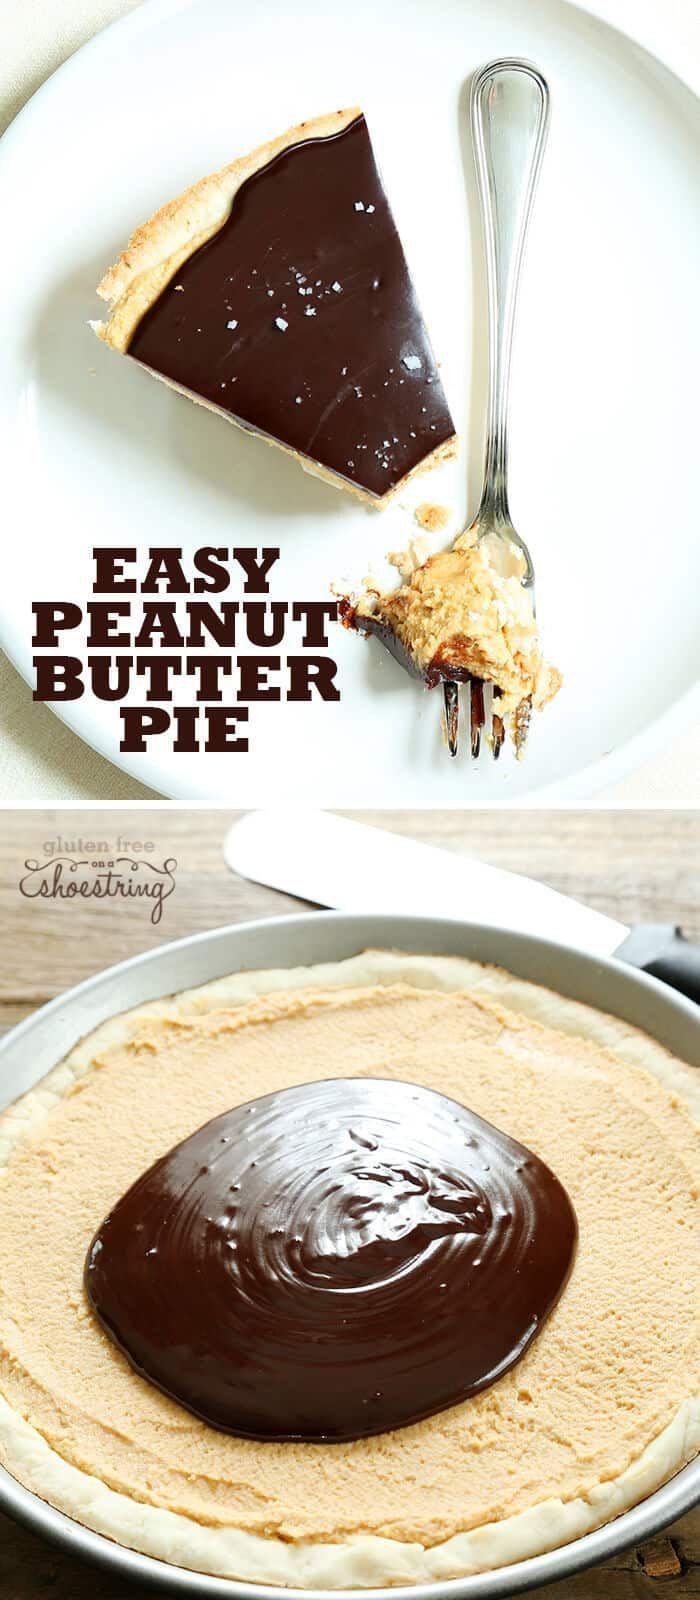 Gluten Free Peanut Butter Pie